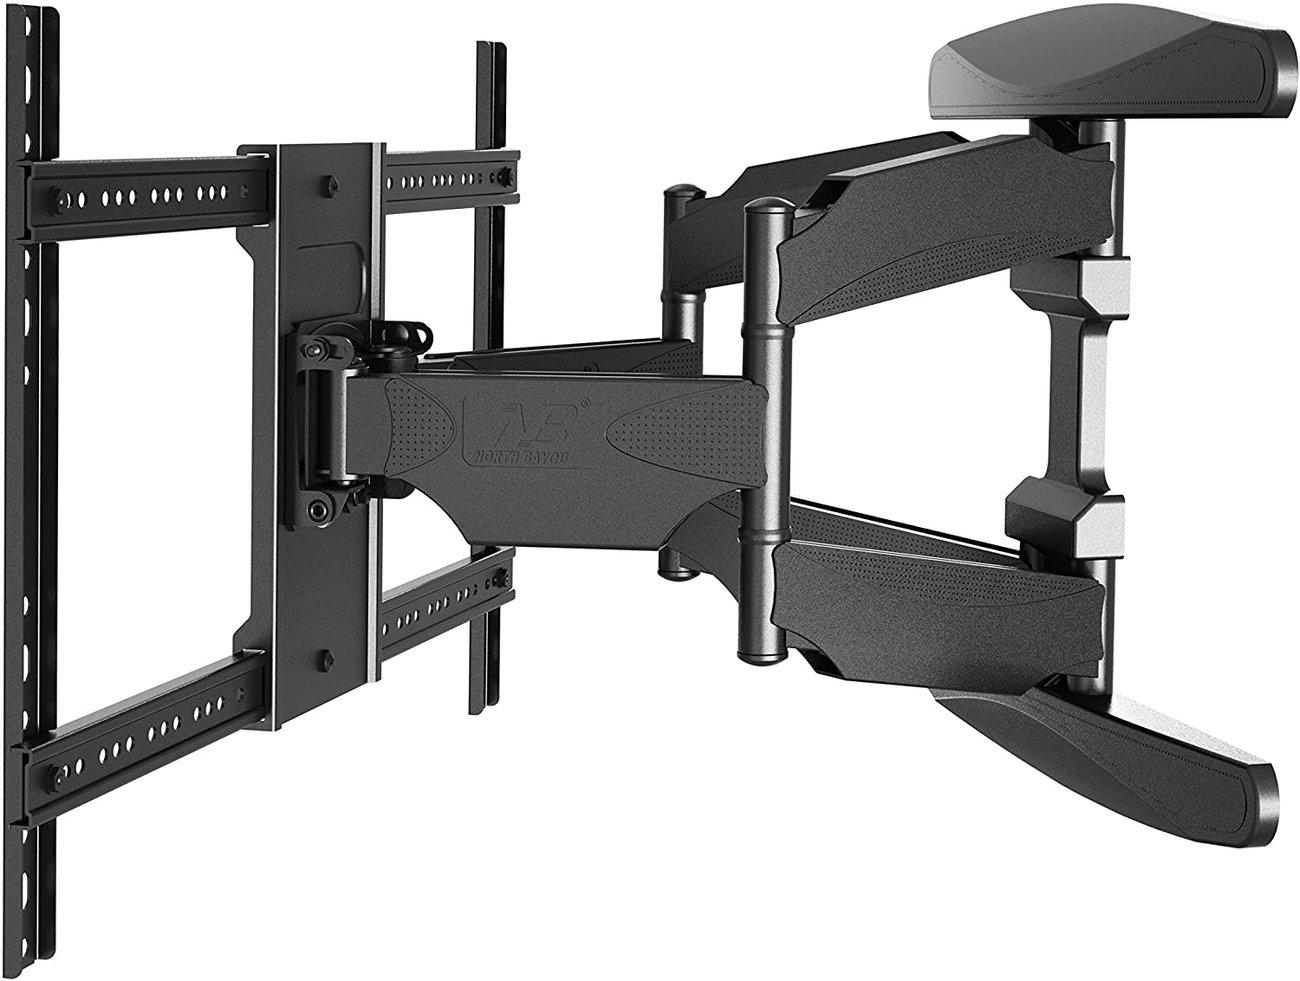 Универсална стойка за телевизор North Bayou P6 40-70 инча Регулируема